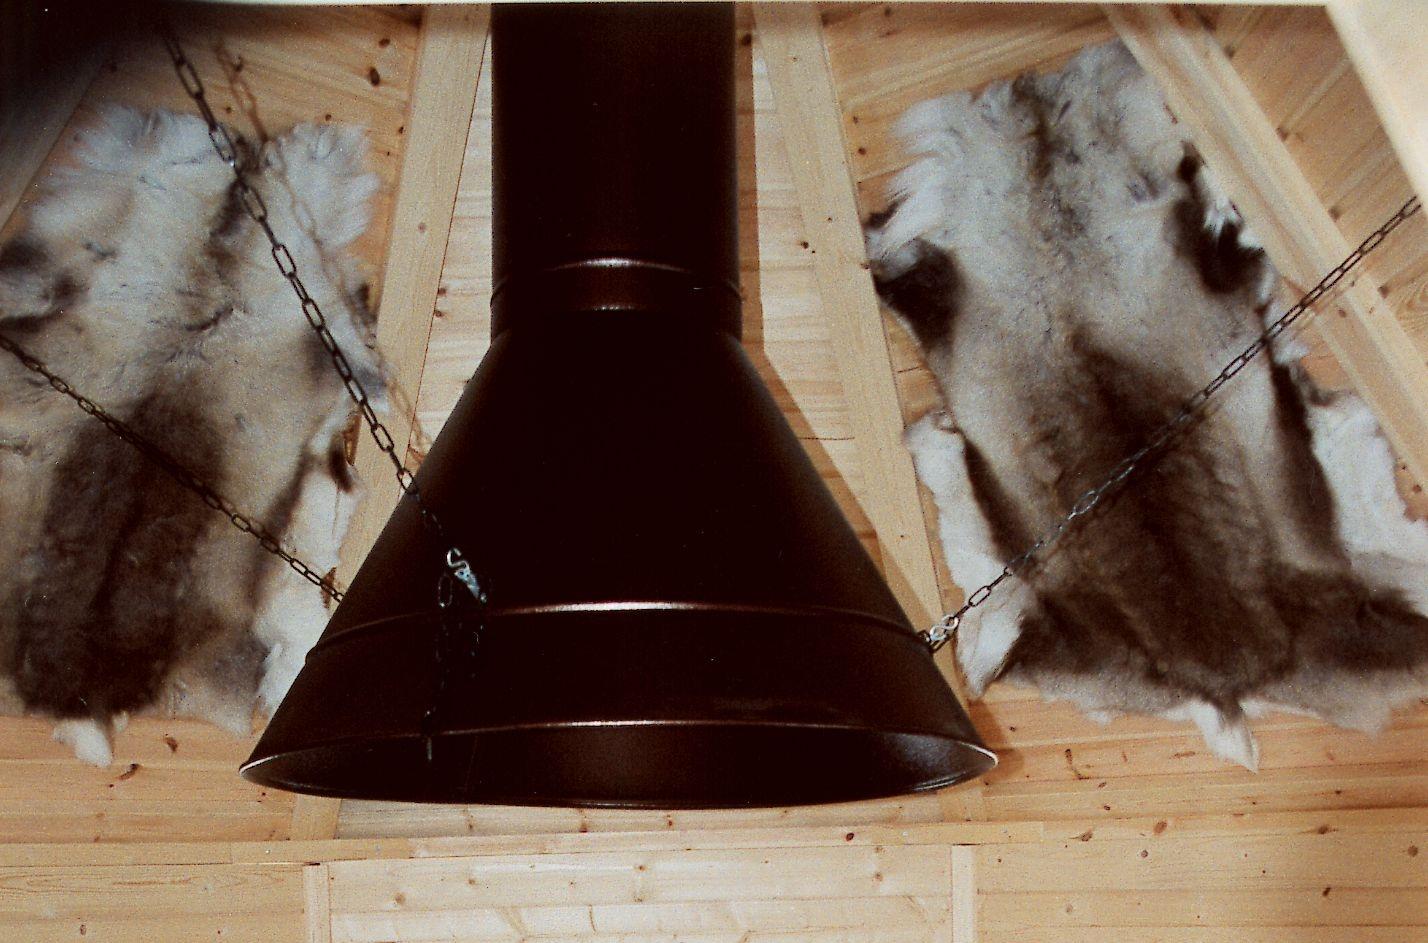 accessoires – kota grill, kota sauna, pod, tonneau